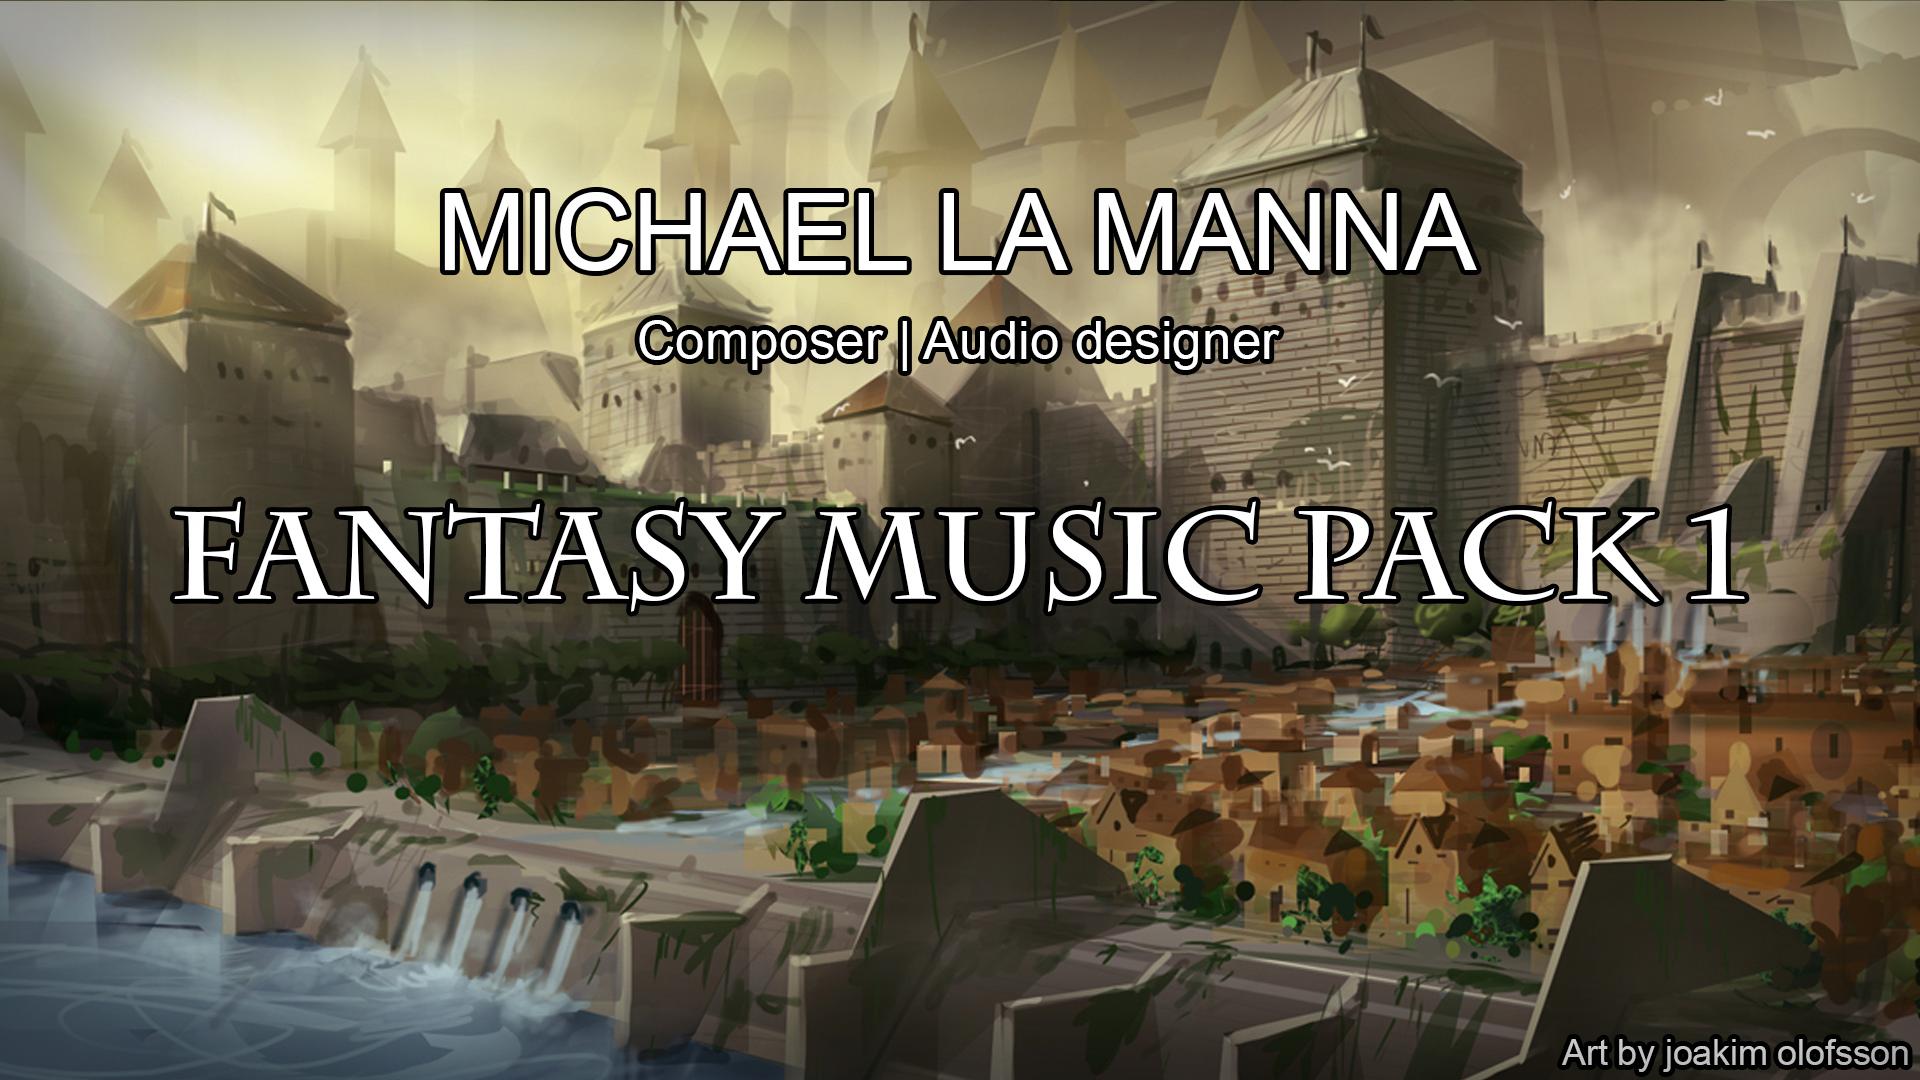 Fantasy Music Pack 1